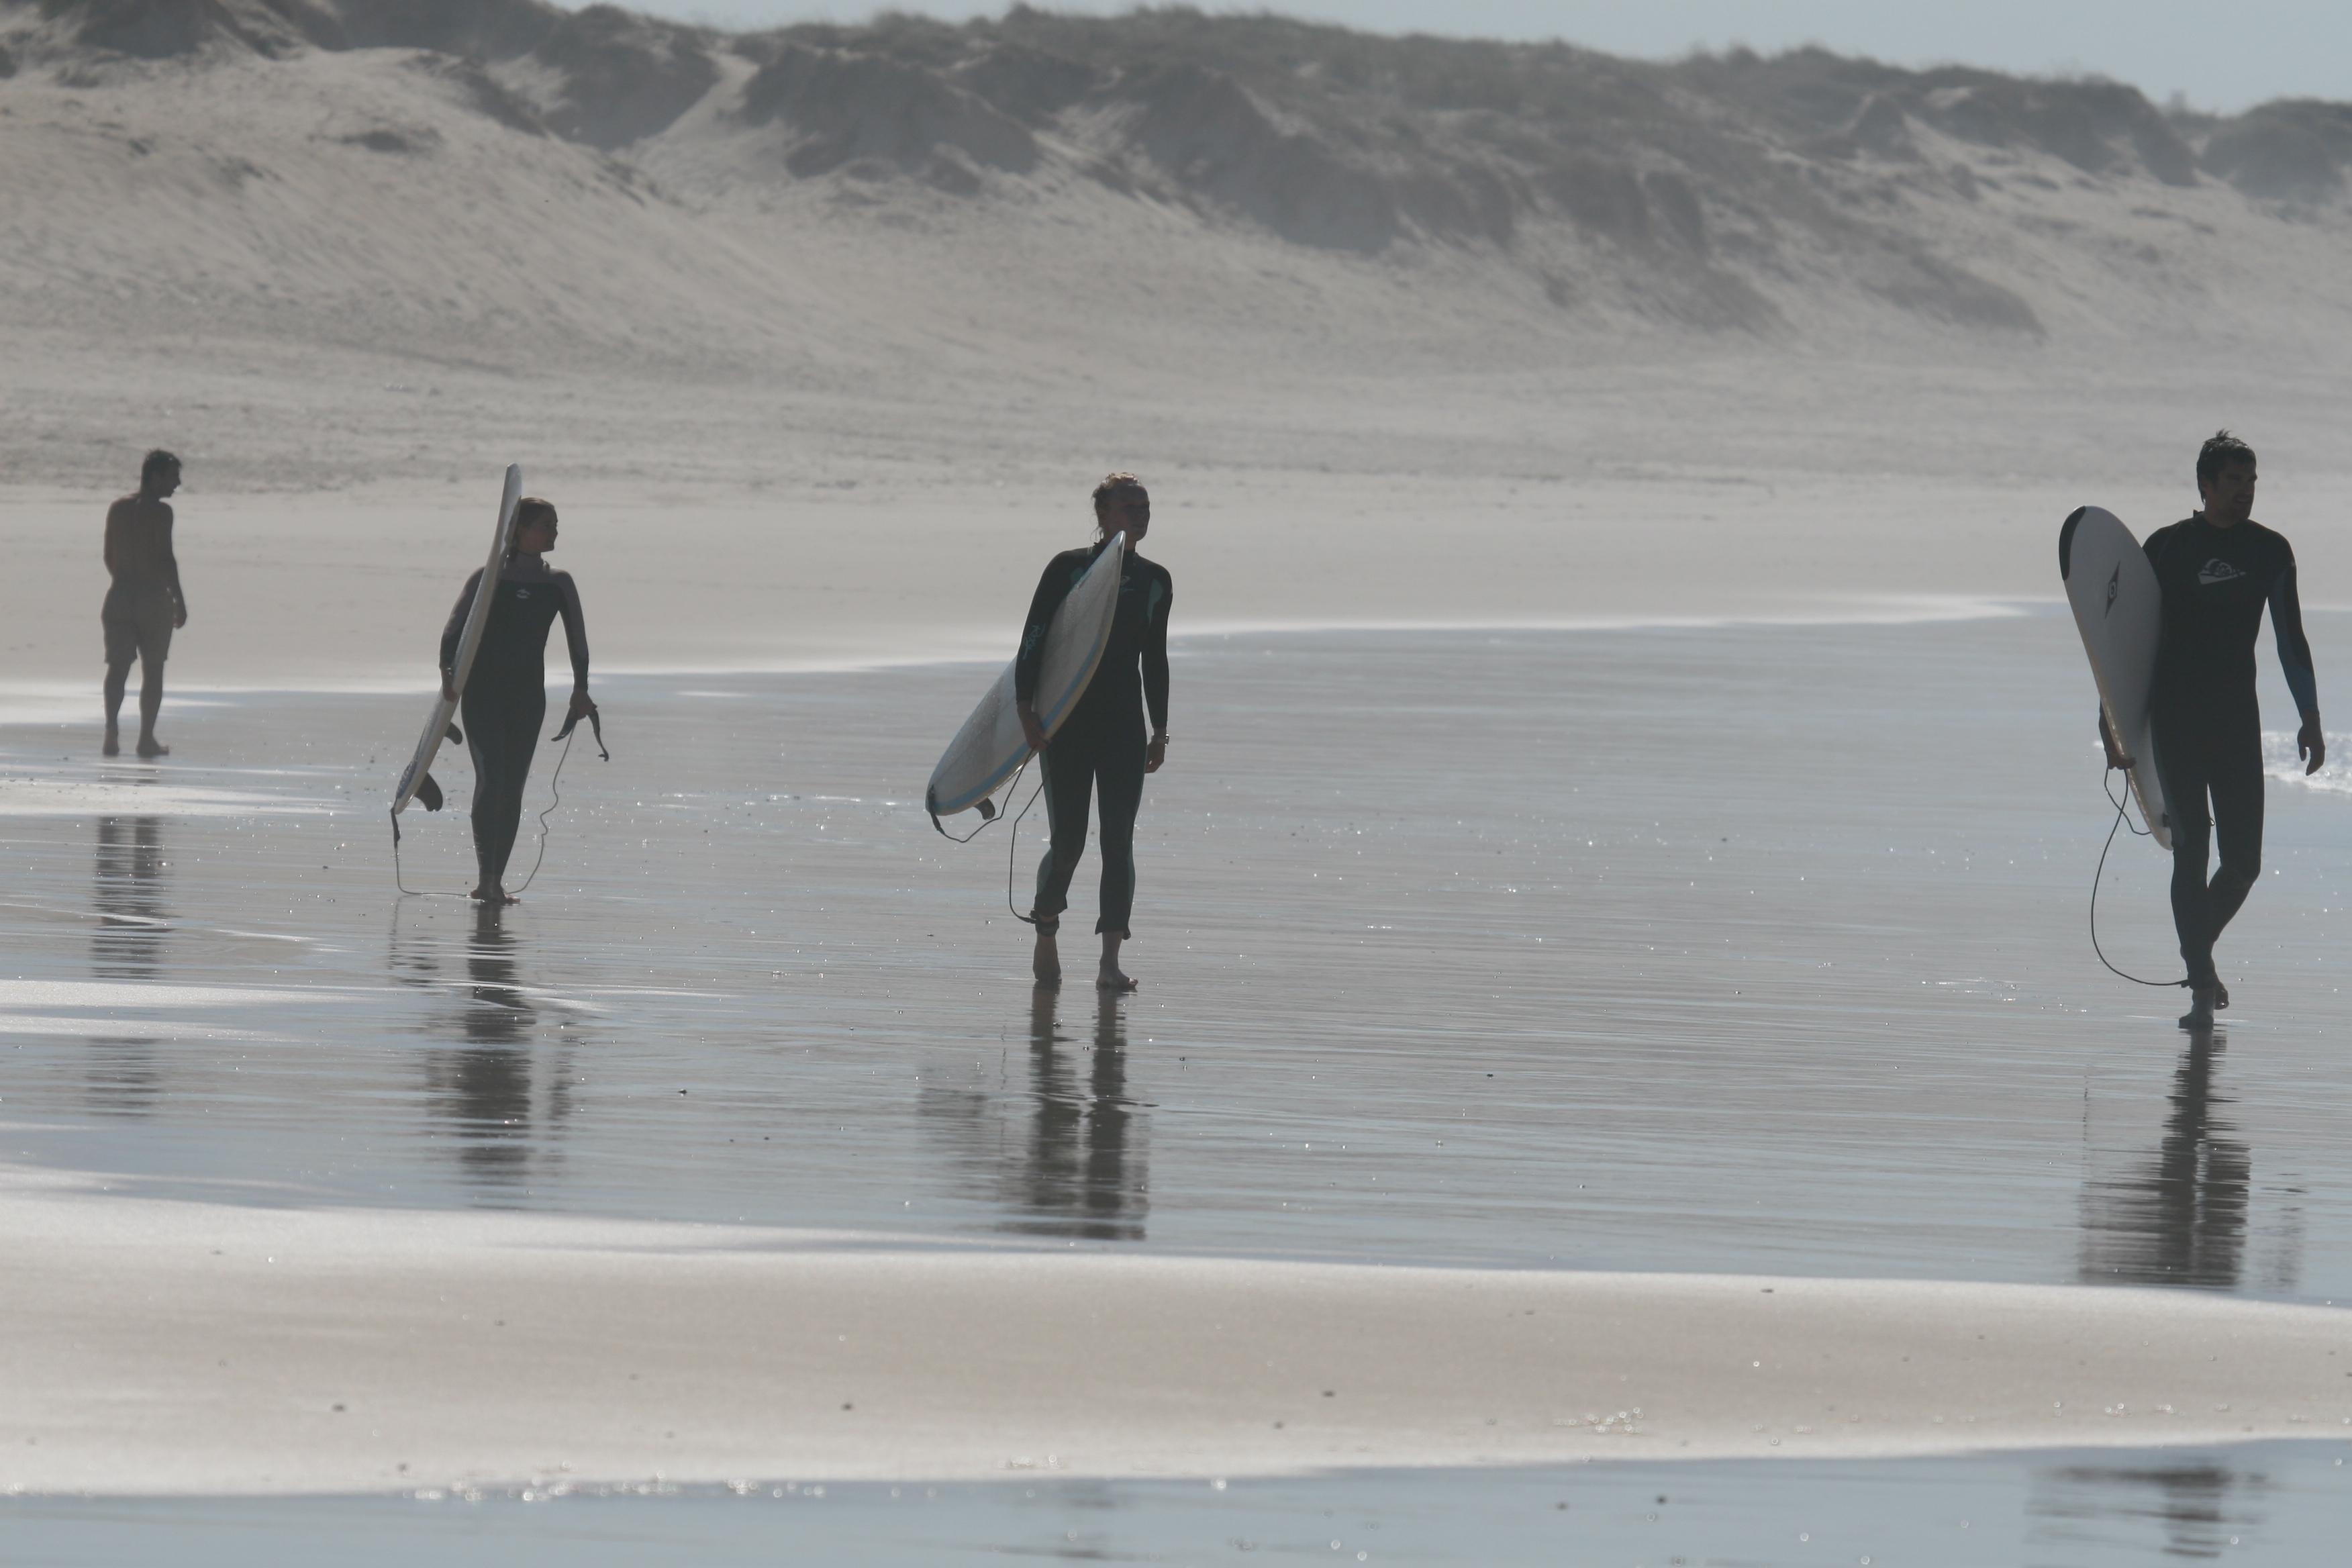 Surf school group